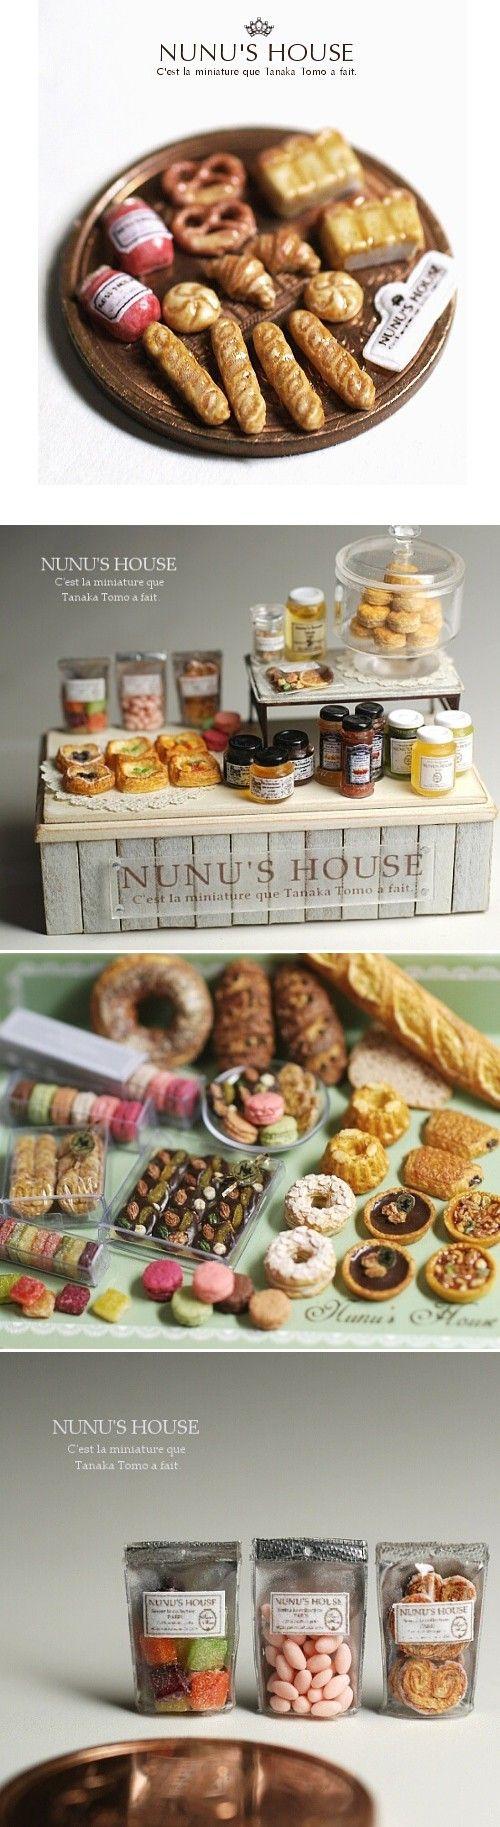 nunu's house miniatures